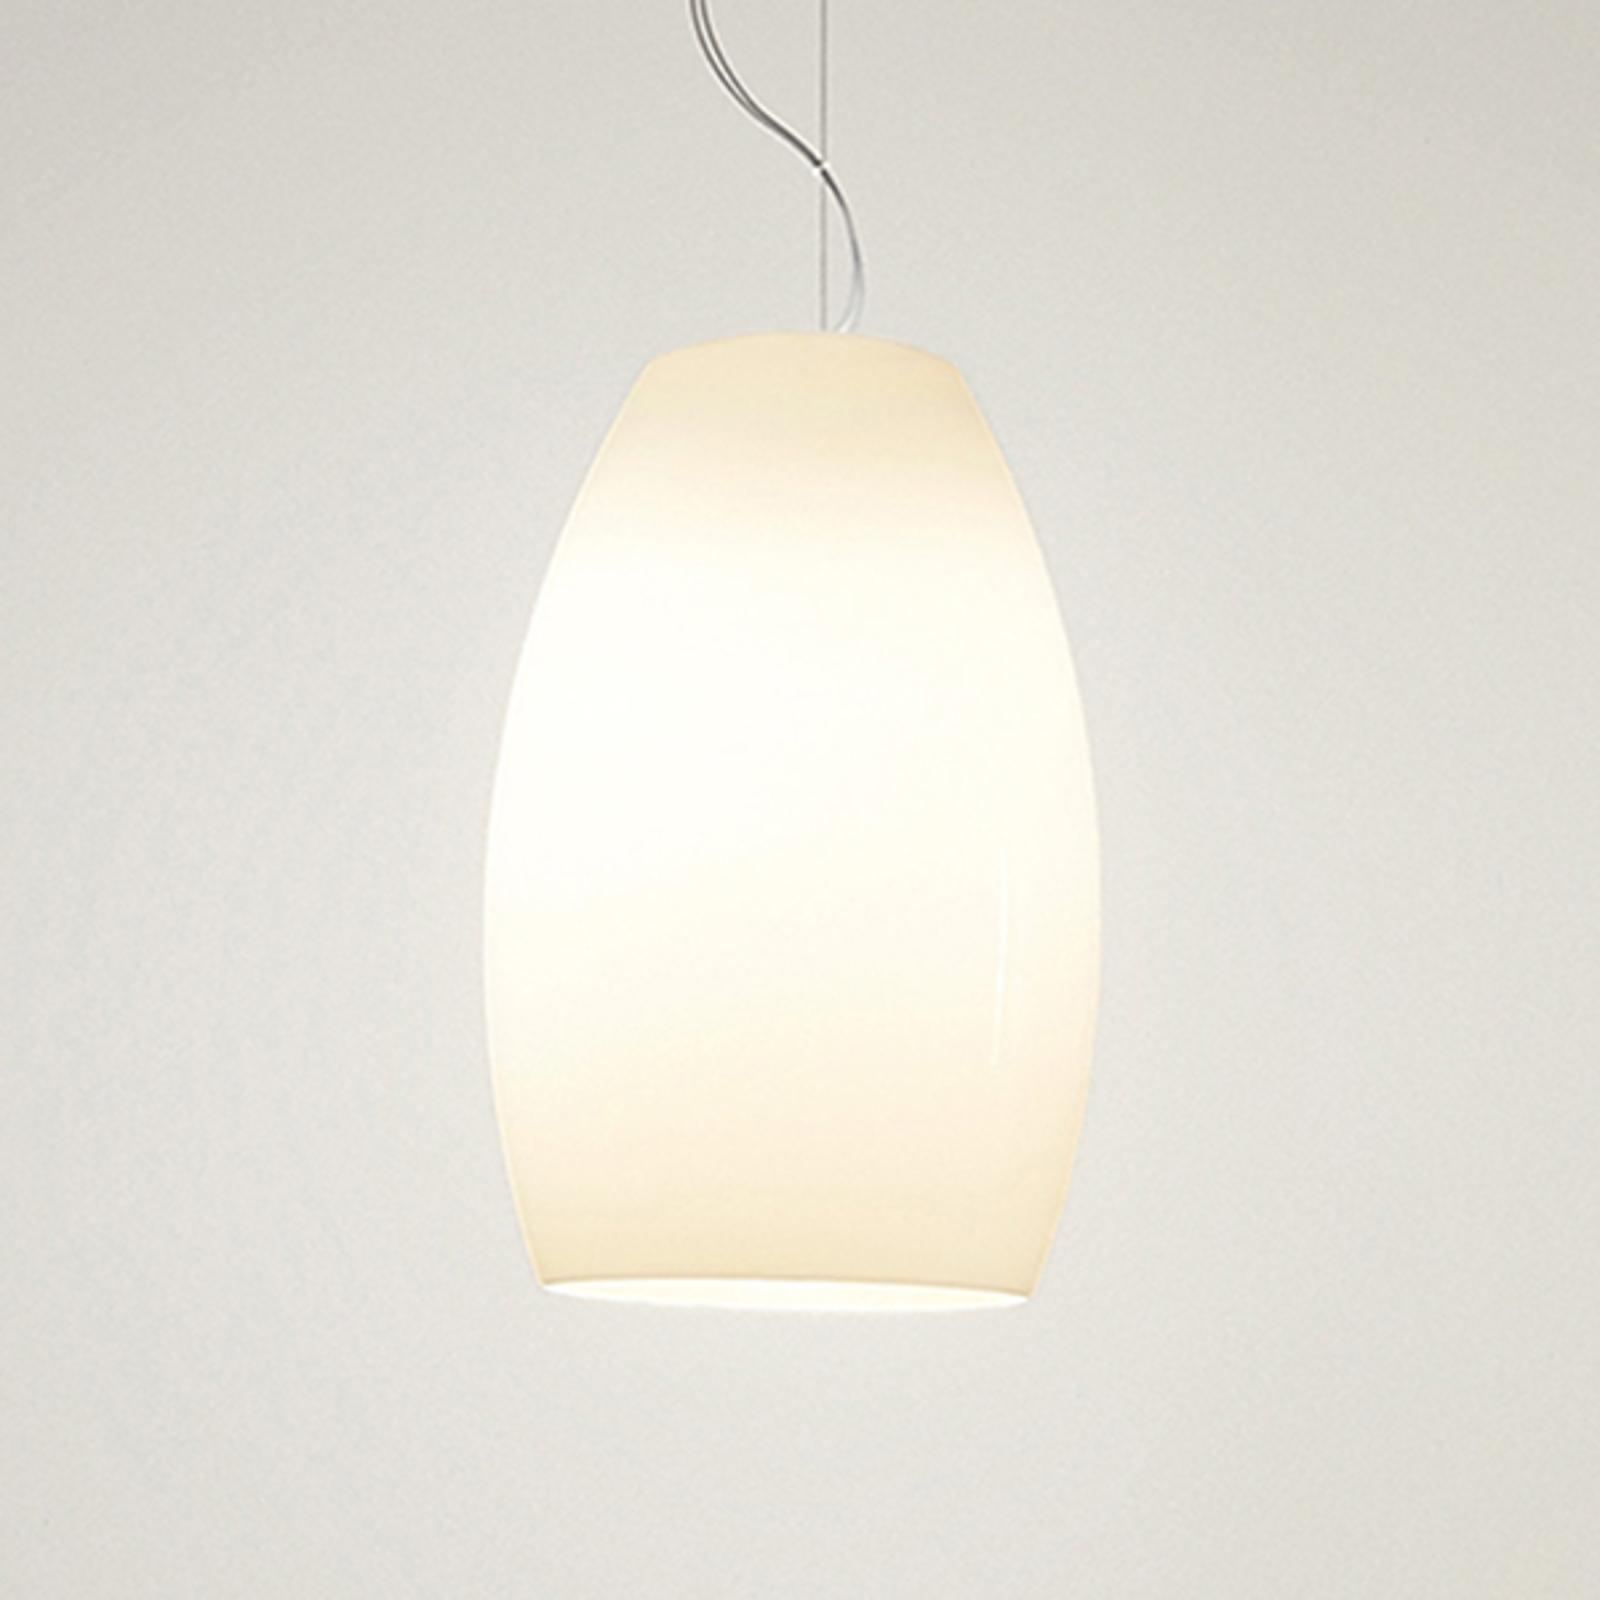 Foscarini Buds 1 LED-Pendelleuchte, E27 weiß